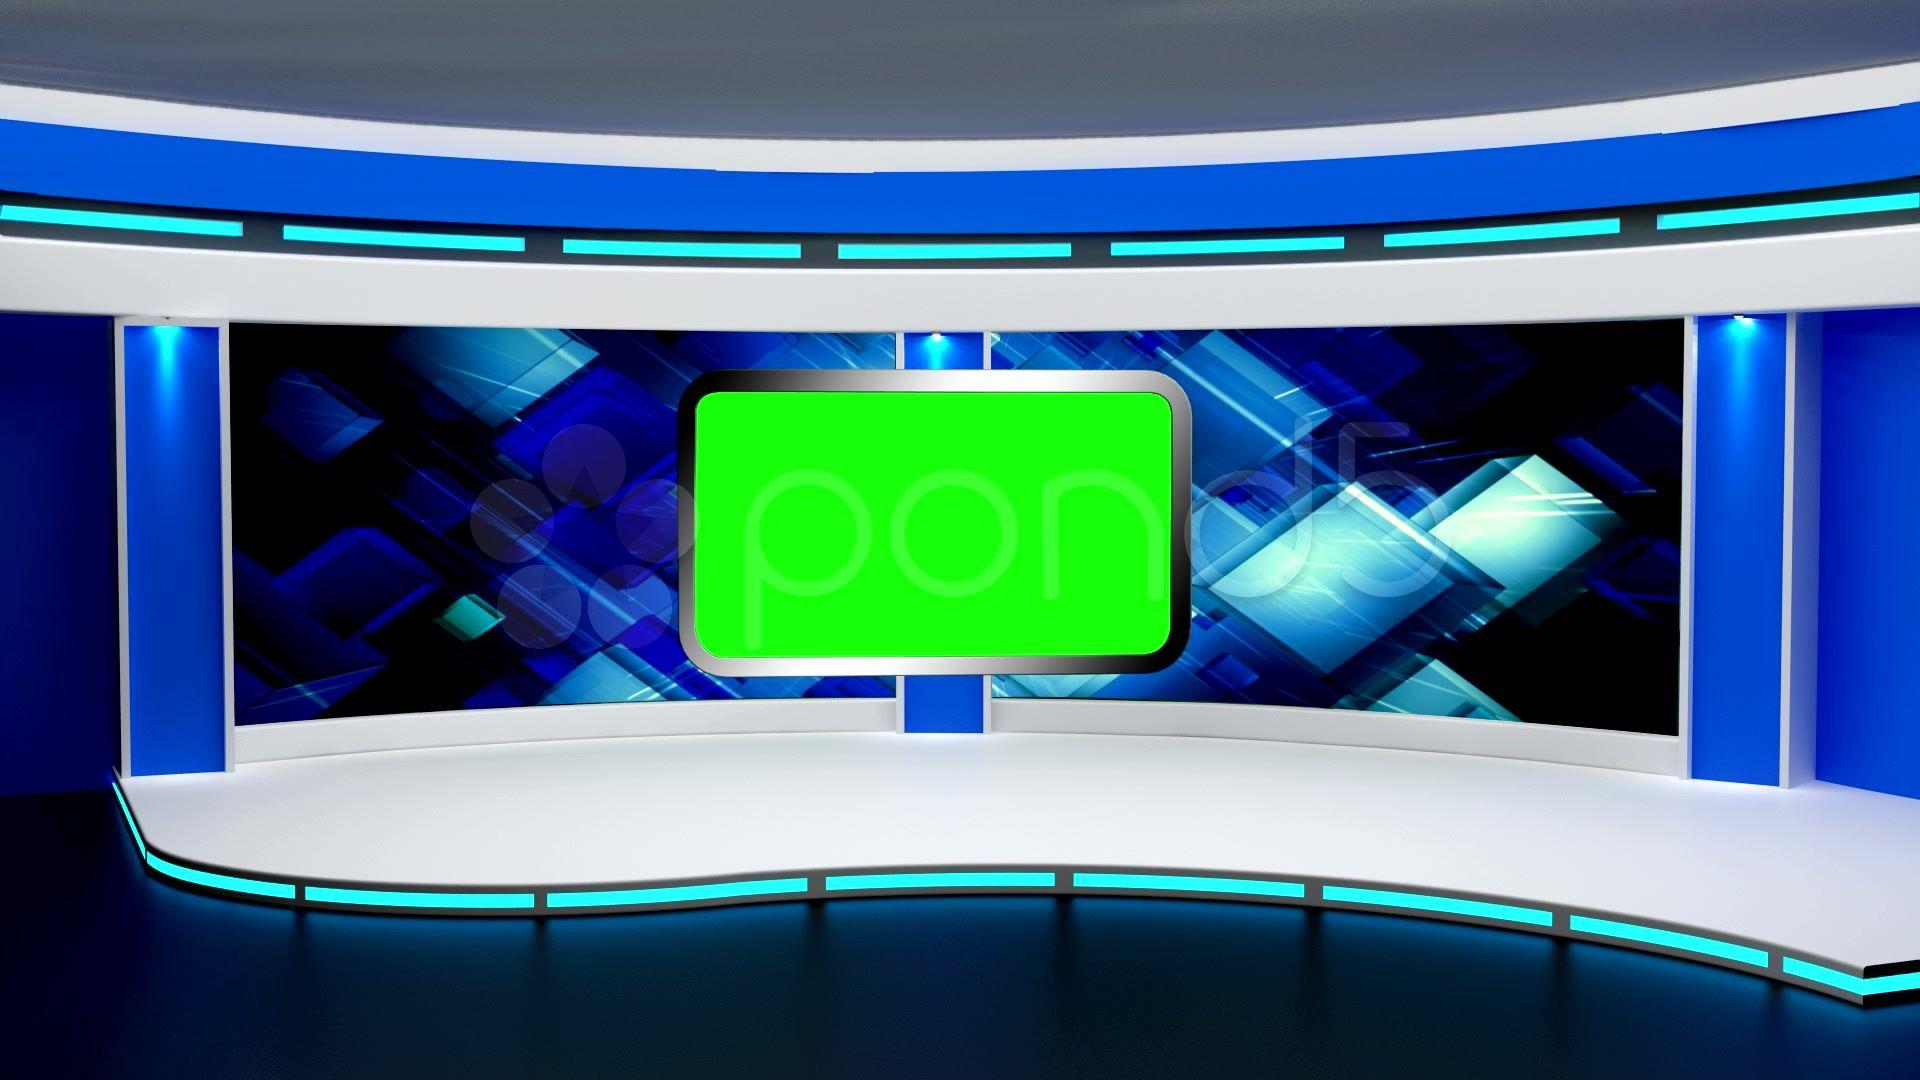 News TV Studio Set 03 Virtual Green Screen Background